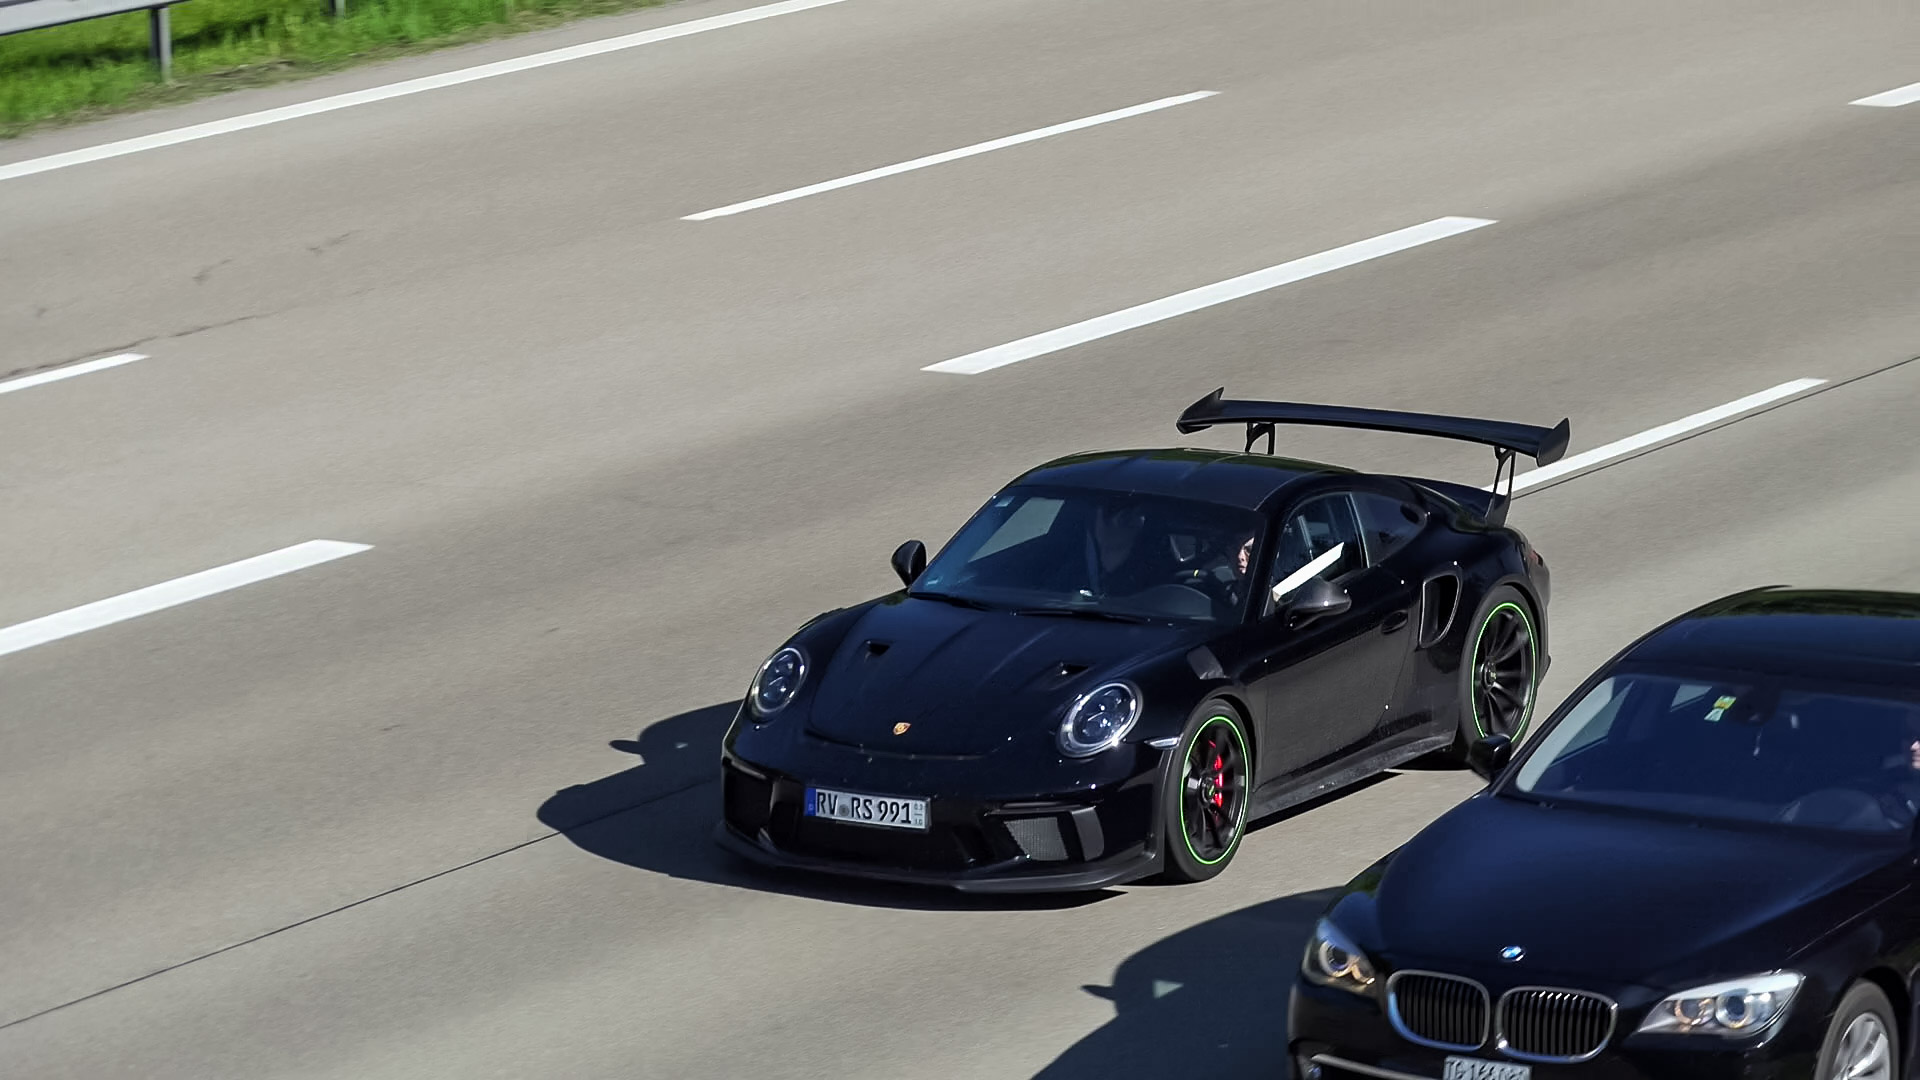 Porsche 911 991.2 GT3 RS - RV-RS-991